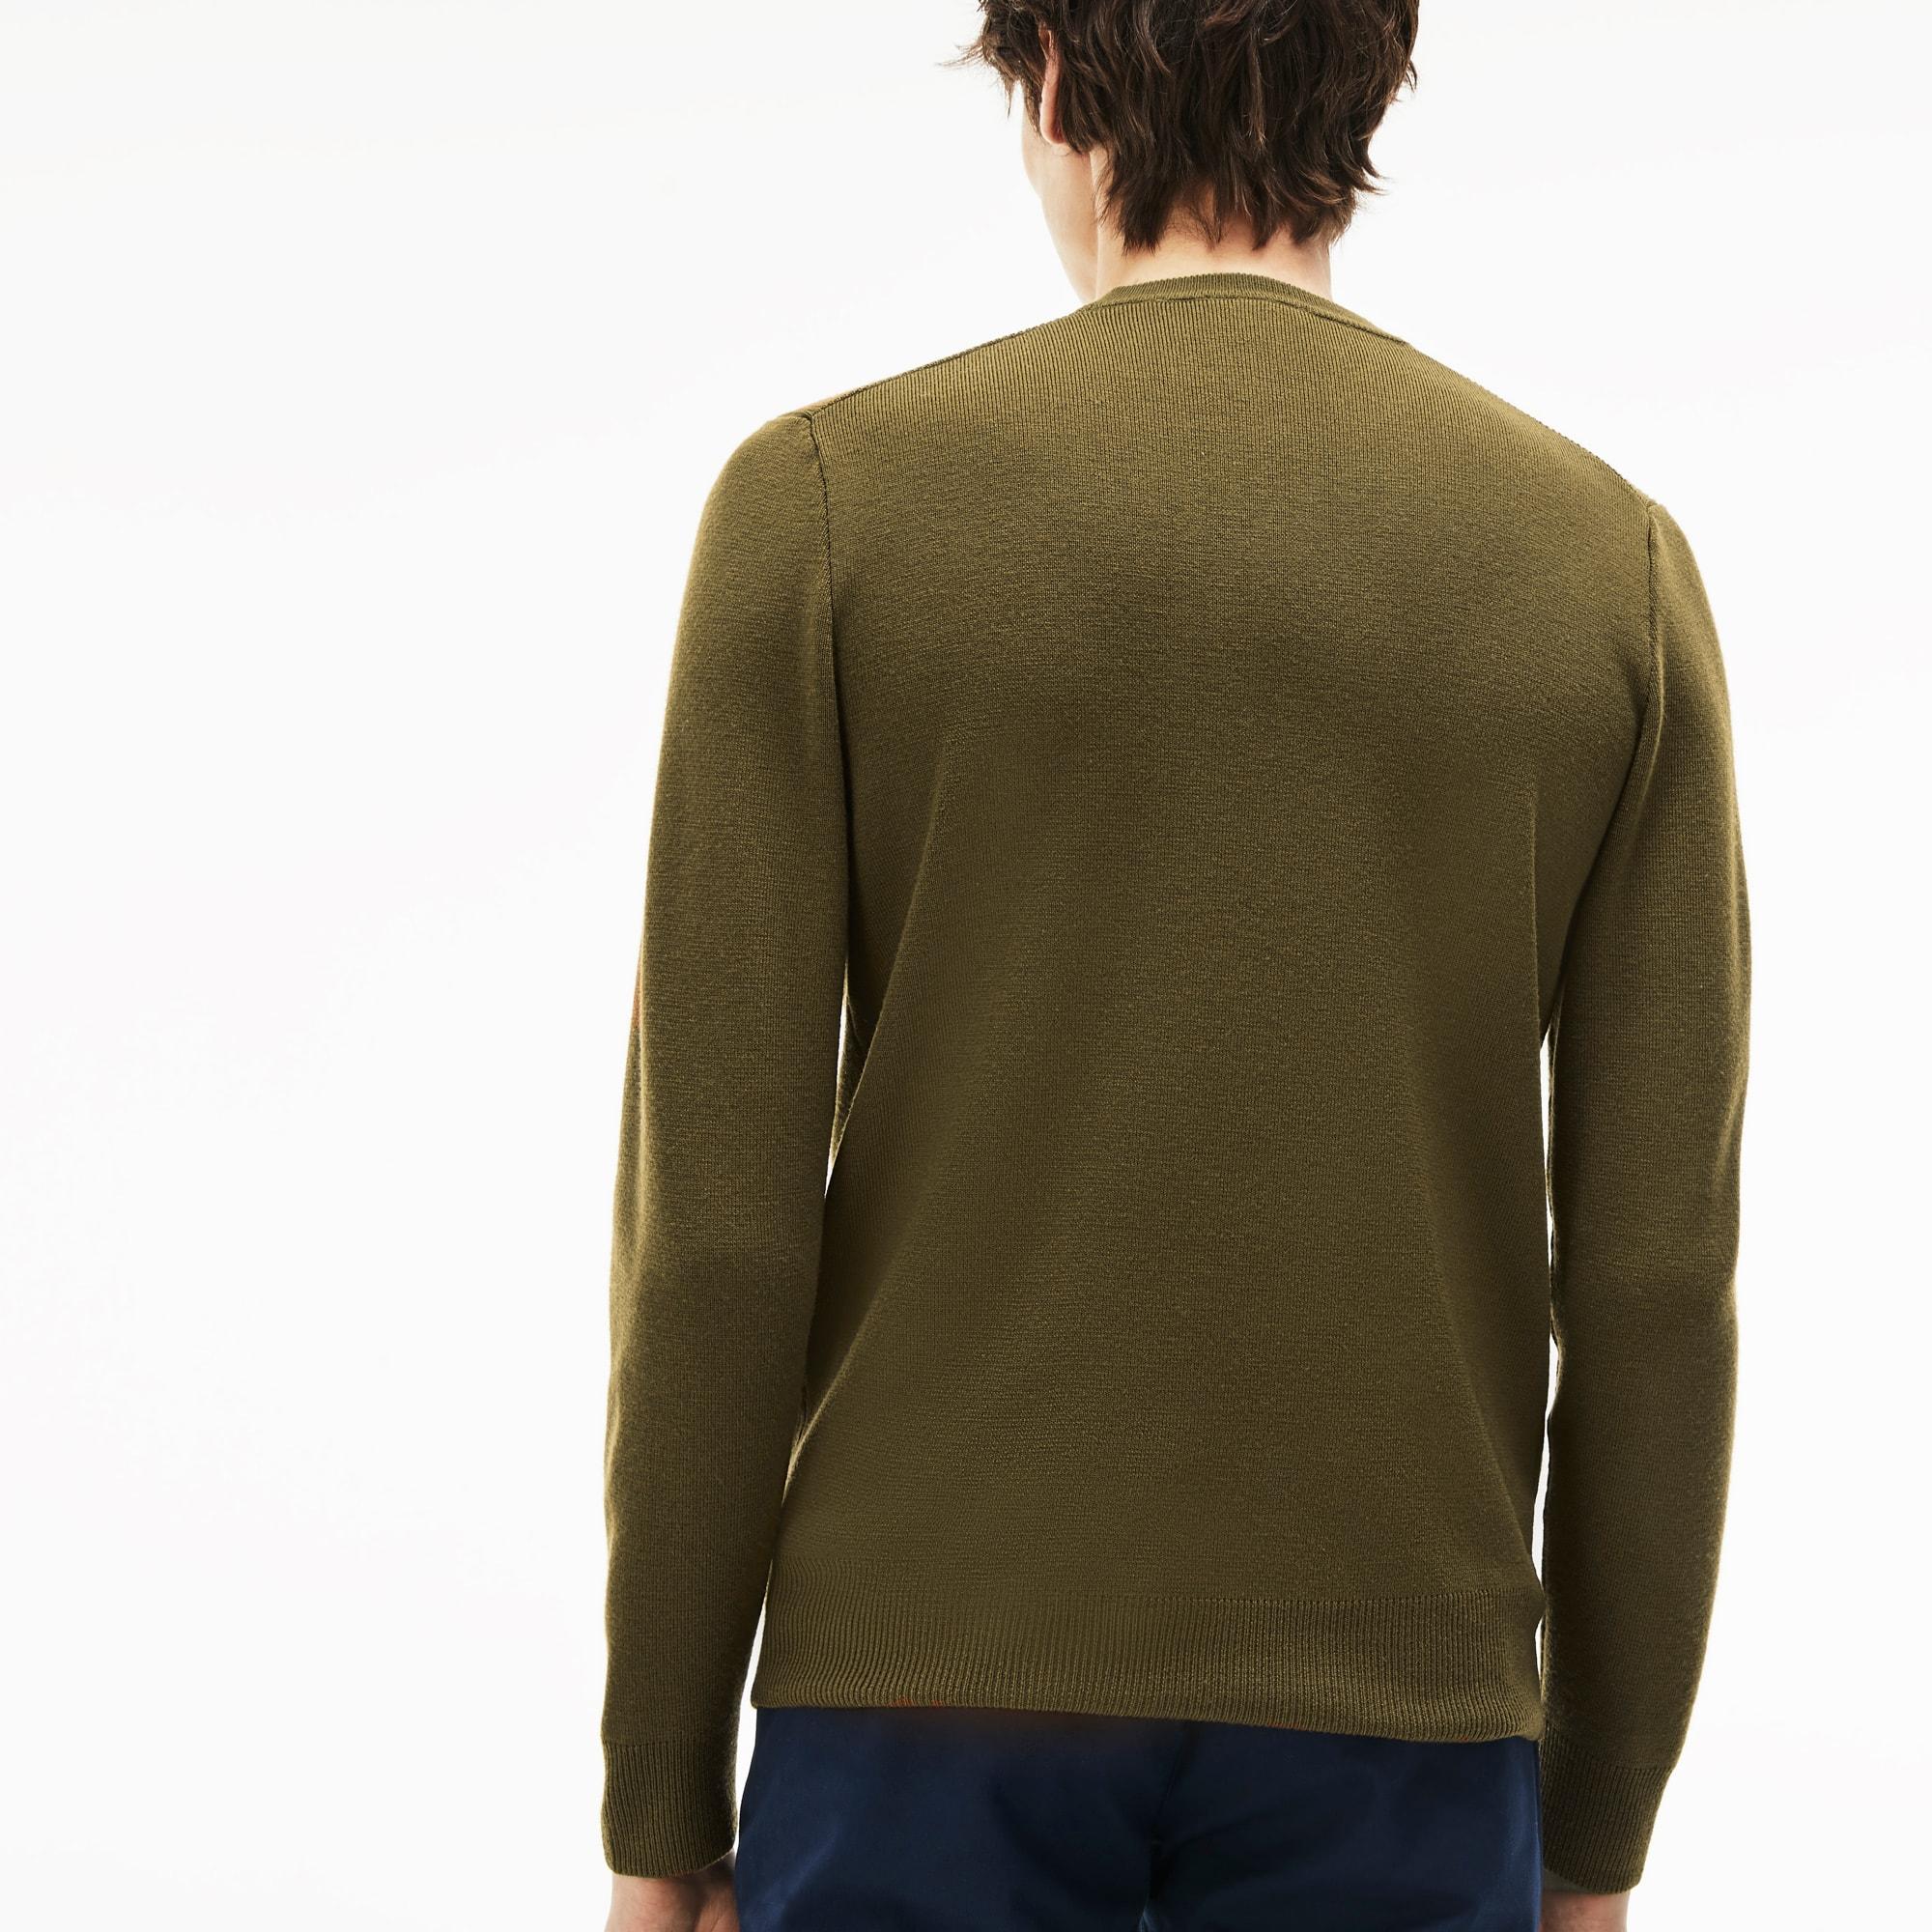 男士圆领科技针织毛衣